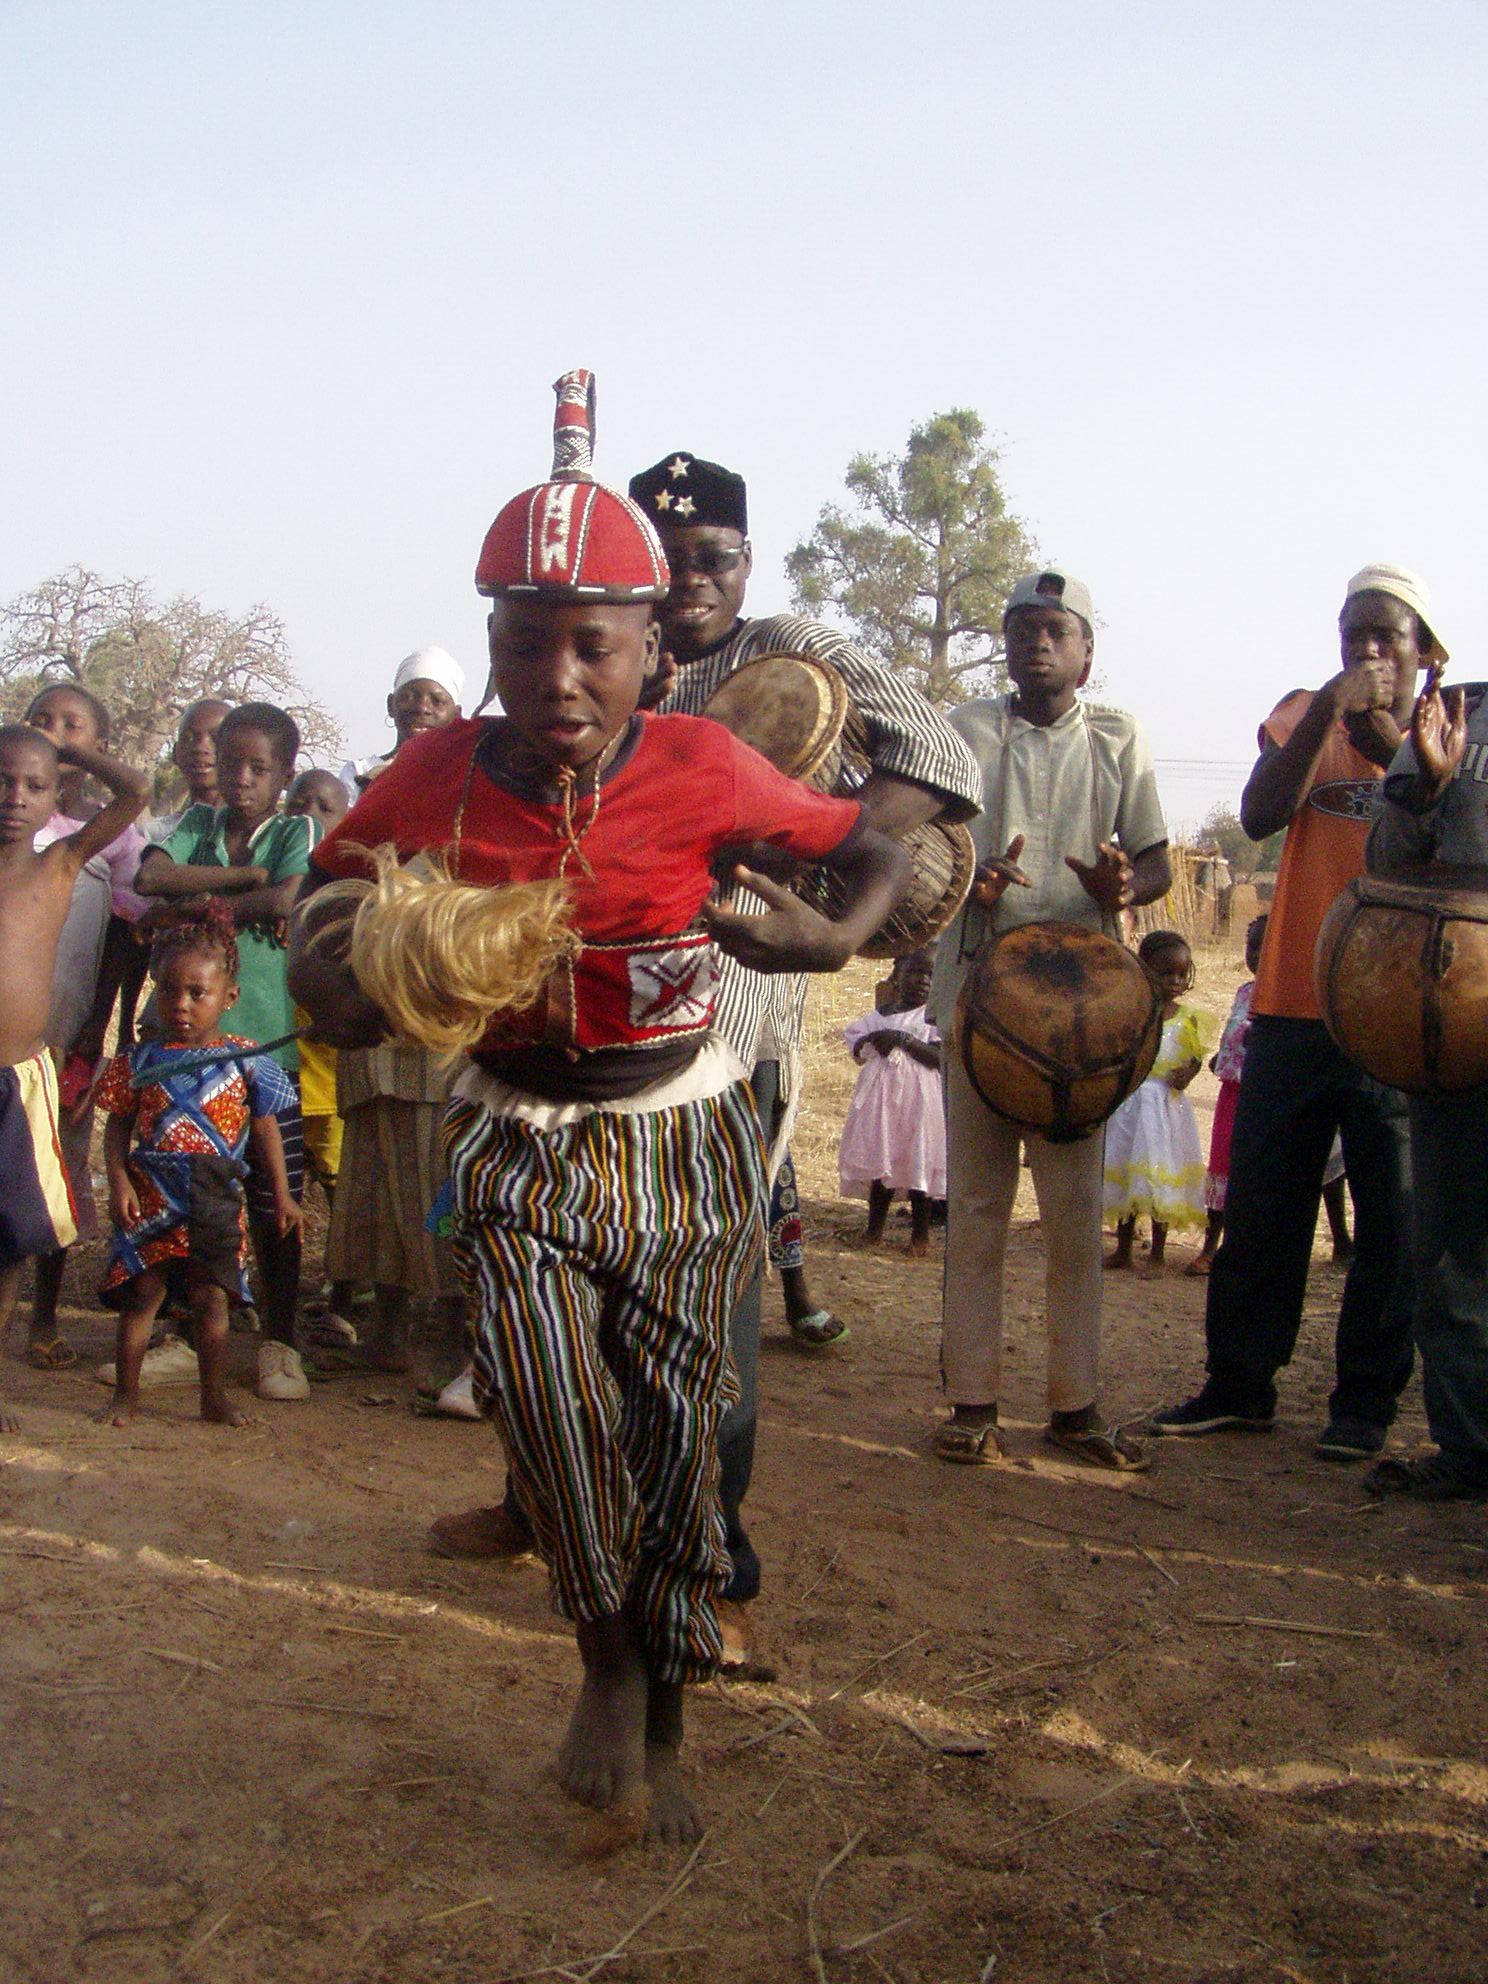 Garçon kassena en train de danser. Kassena boy danceing.